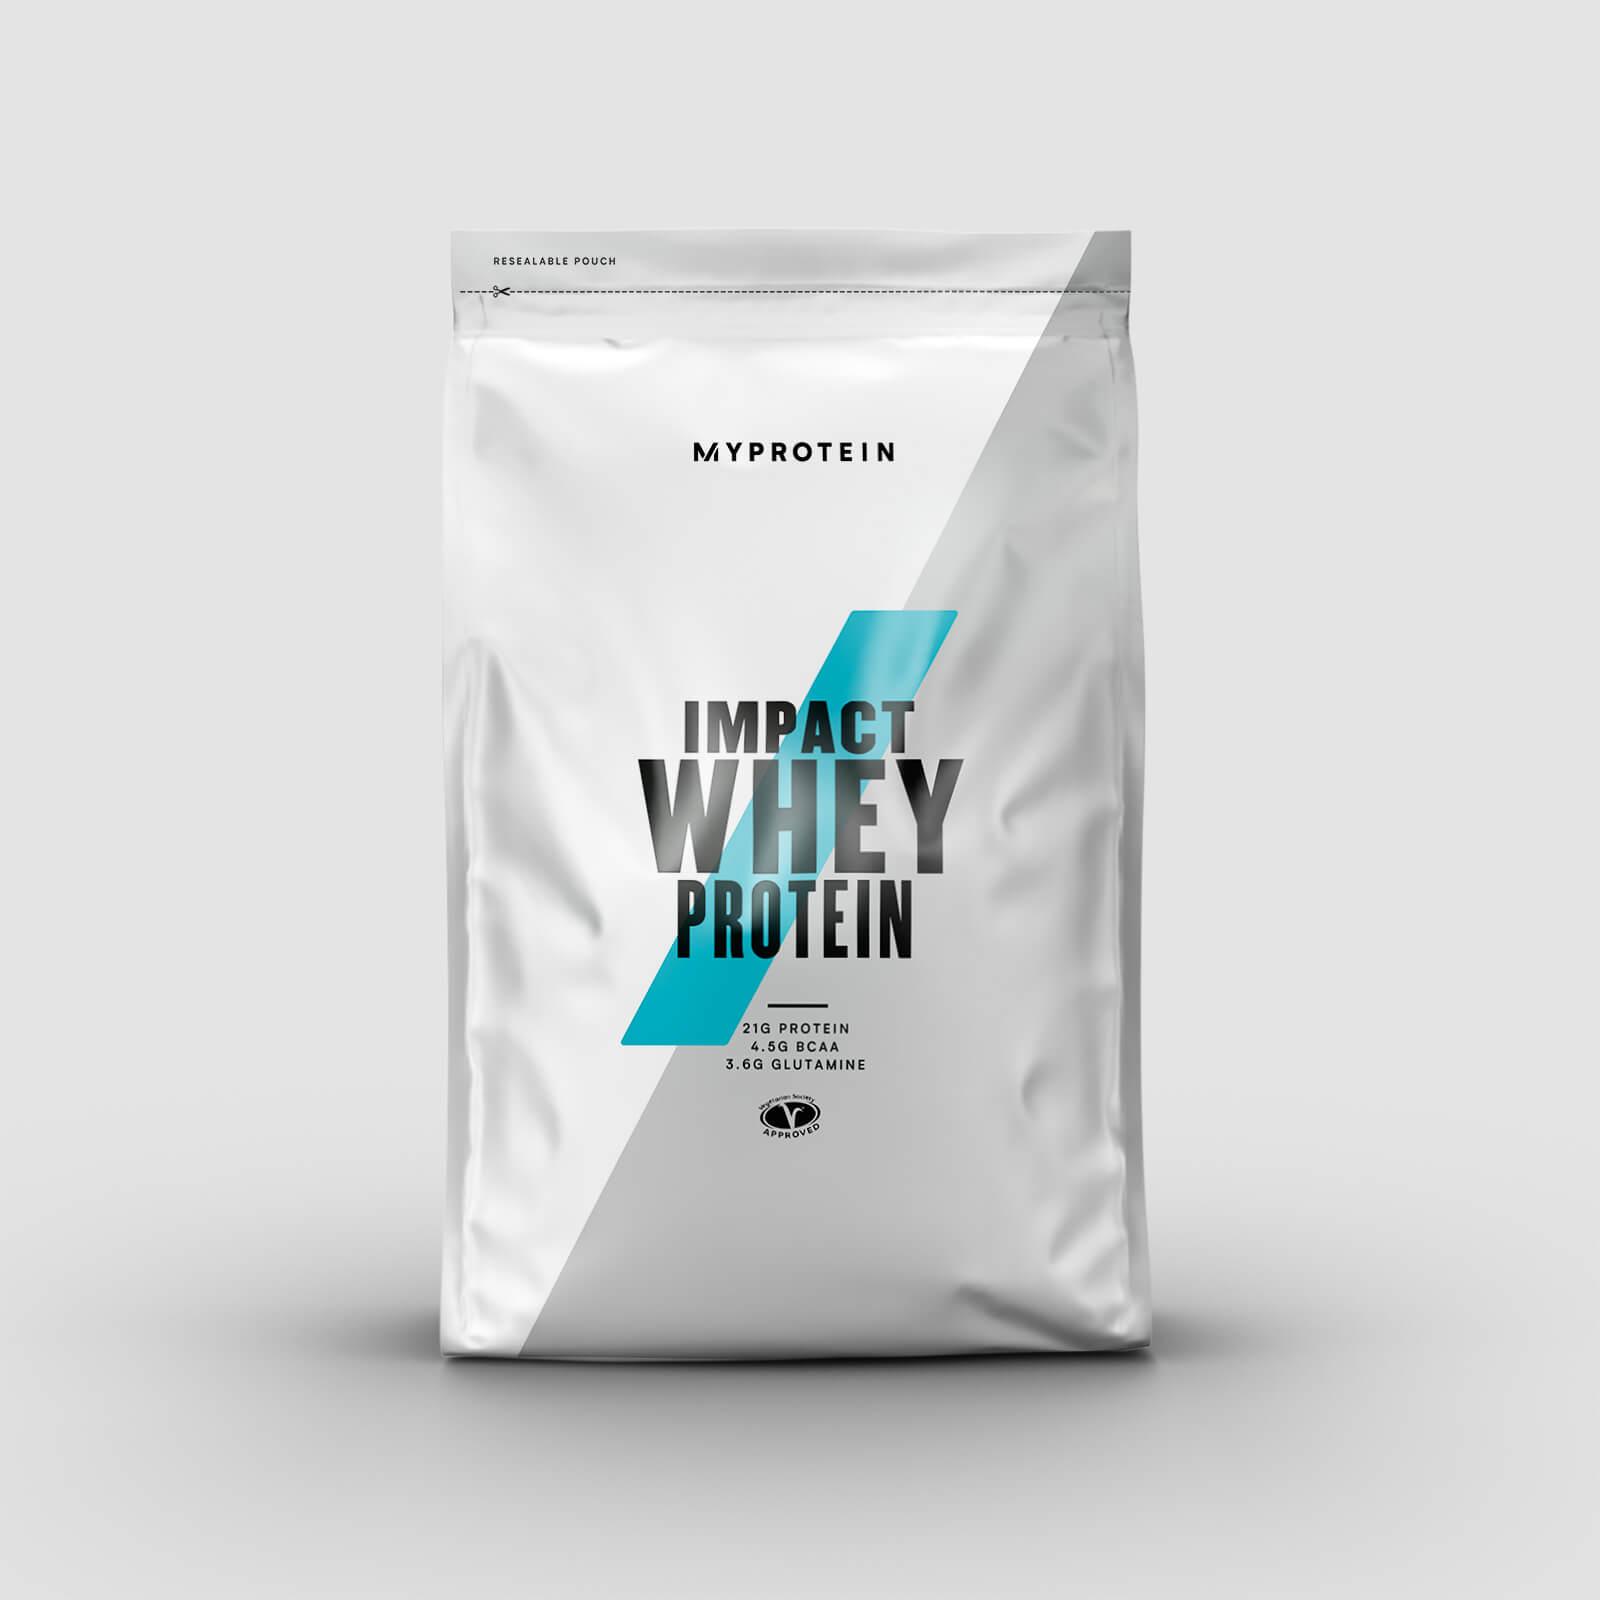 Myprotein Impact Whey Protein - 1kg - Chocolat-Beurre de Cacahuète